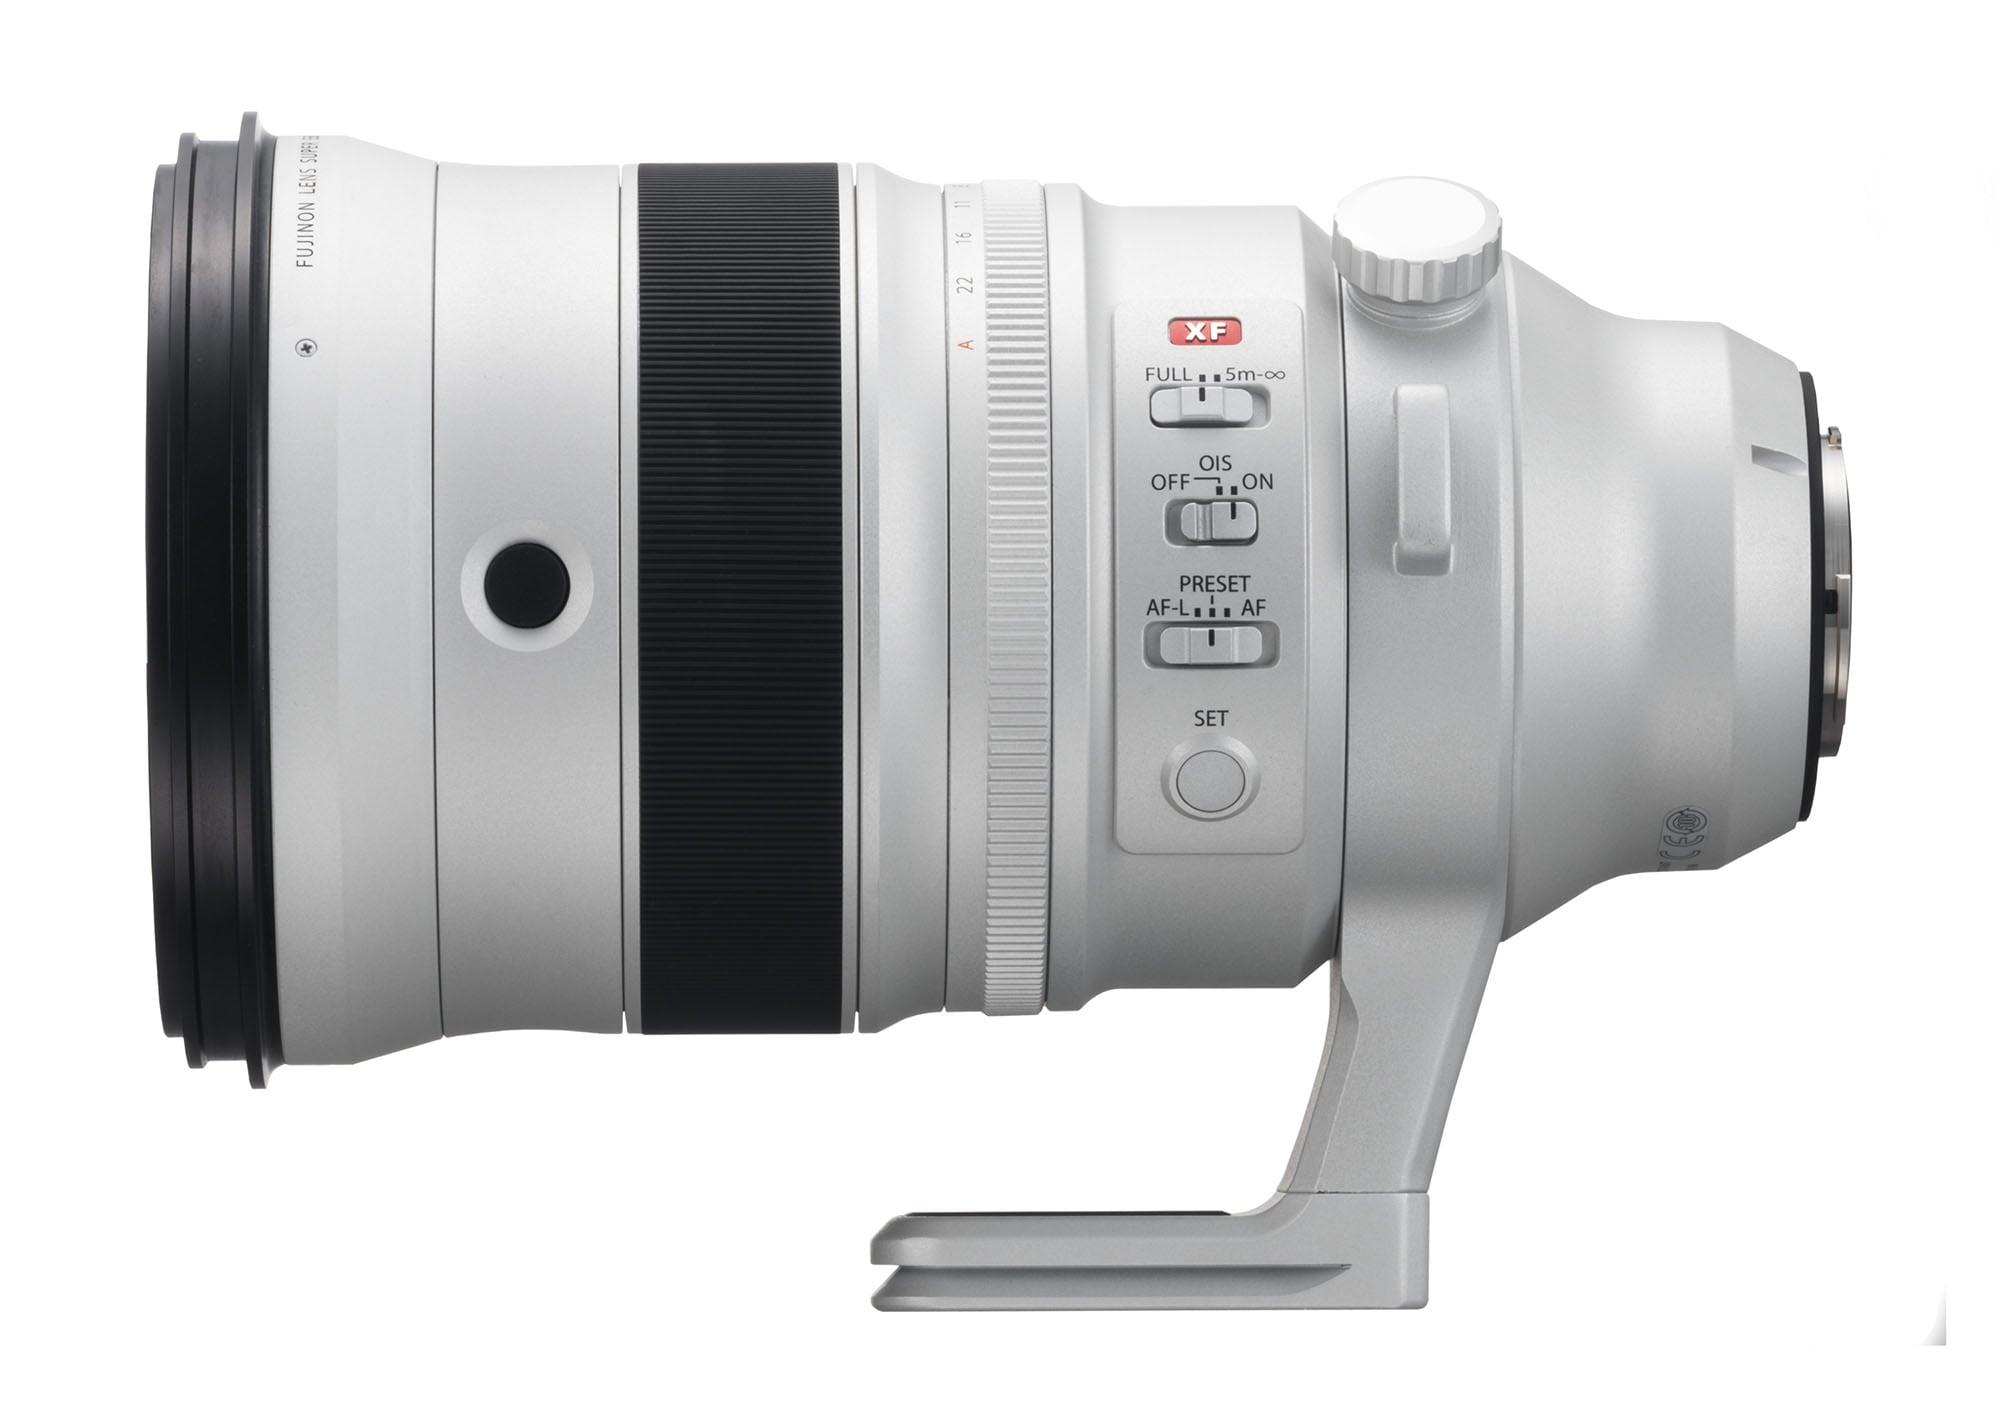 Fujifilm XF 200mm f/2,0 LM OIS WR Inkl. XF 1,4x TC WR